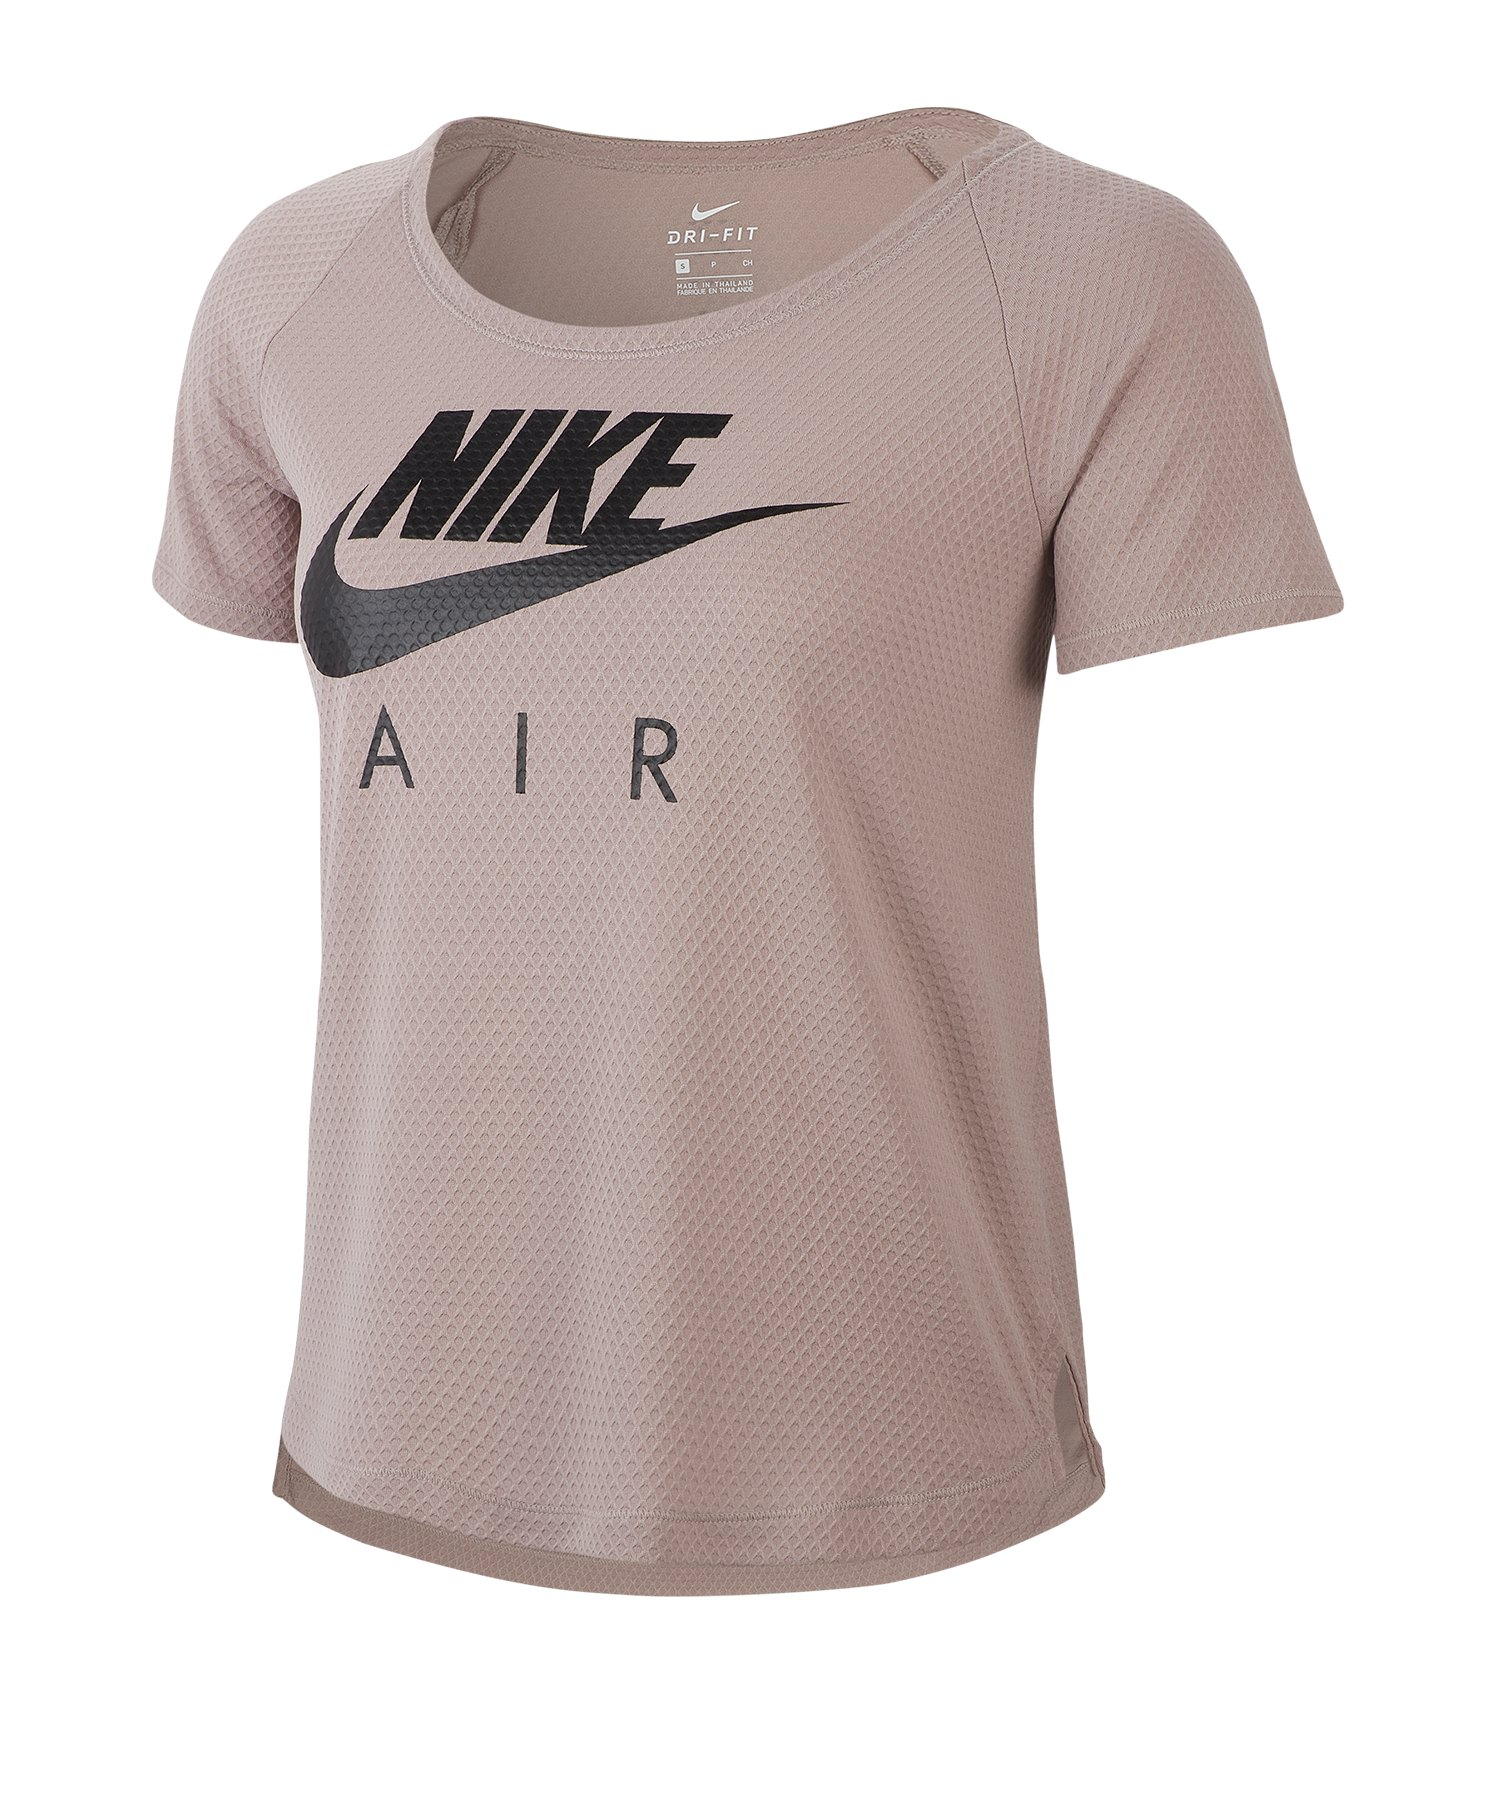 Nike Running Shirt kurzarm Damen Braun F218 - braun